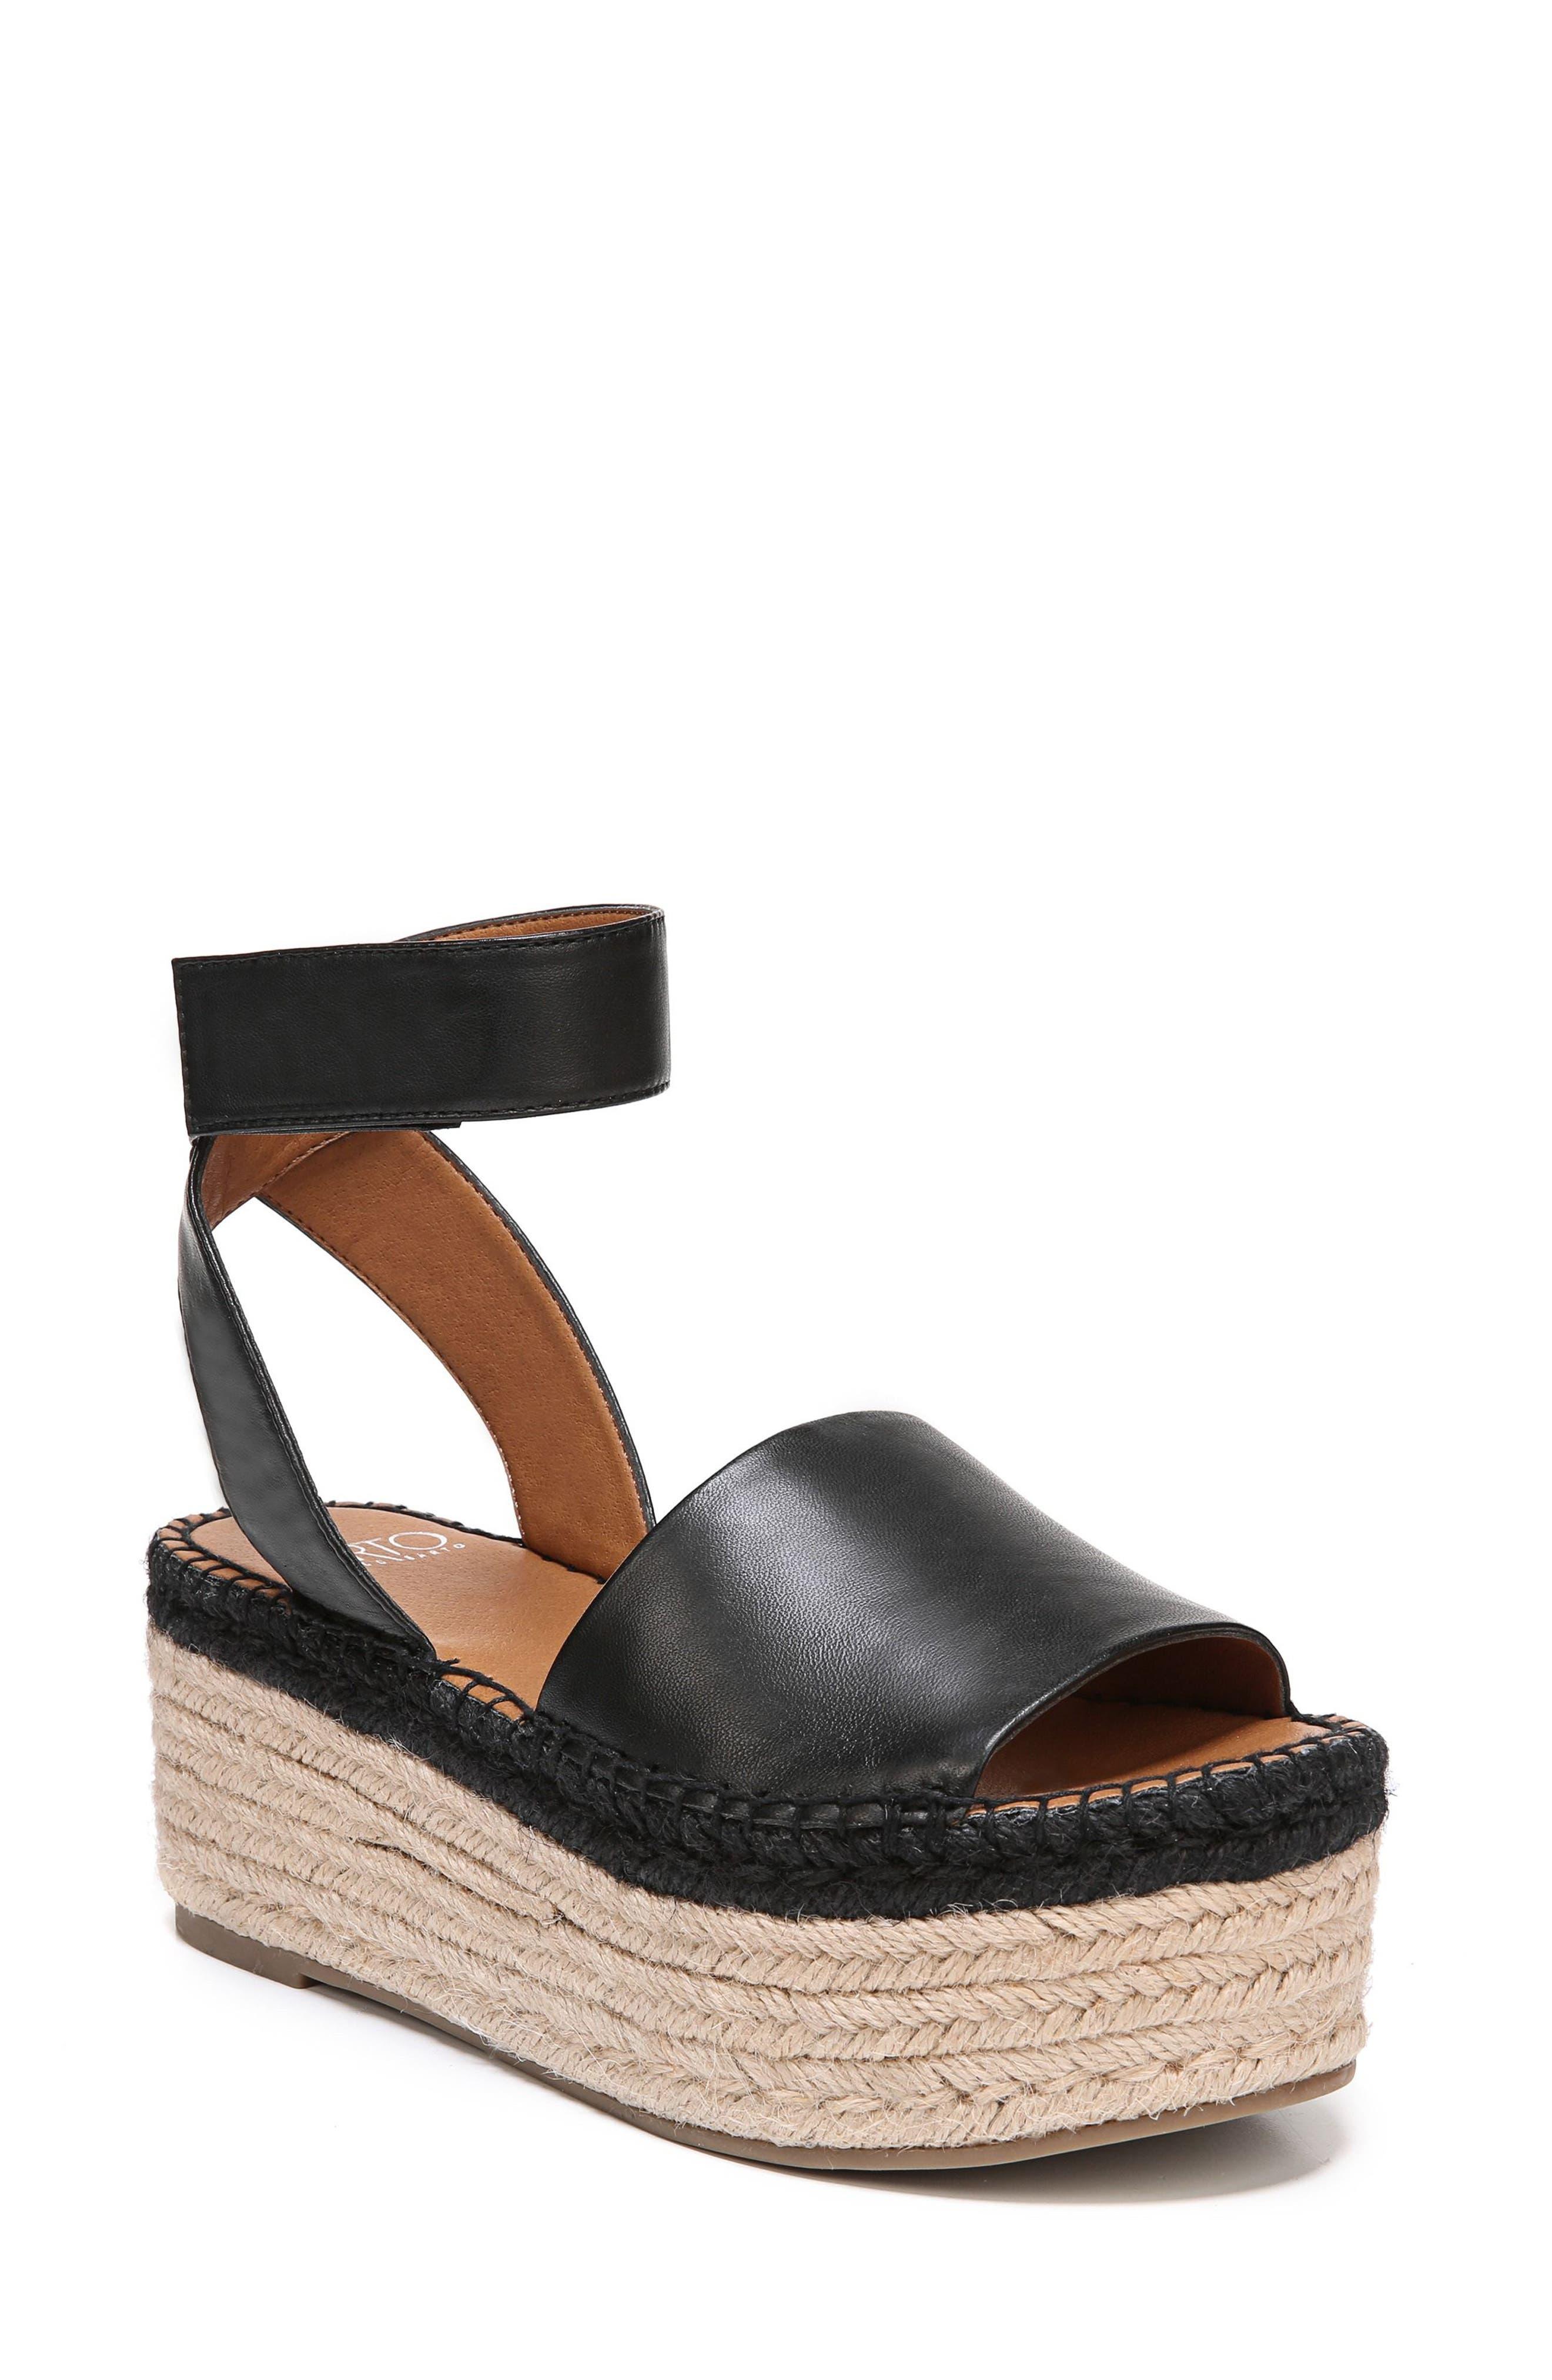 Maisi Platform Espadrille Sandal,                             Main thumbnail 1, color,                             BLACK LEATHER